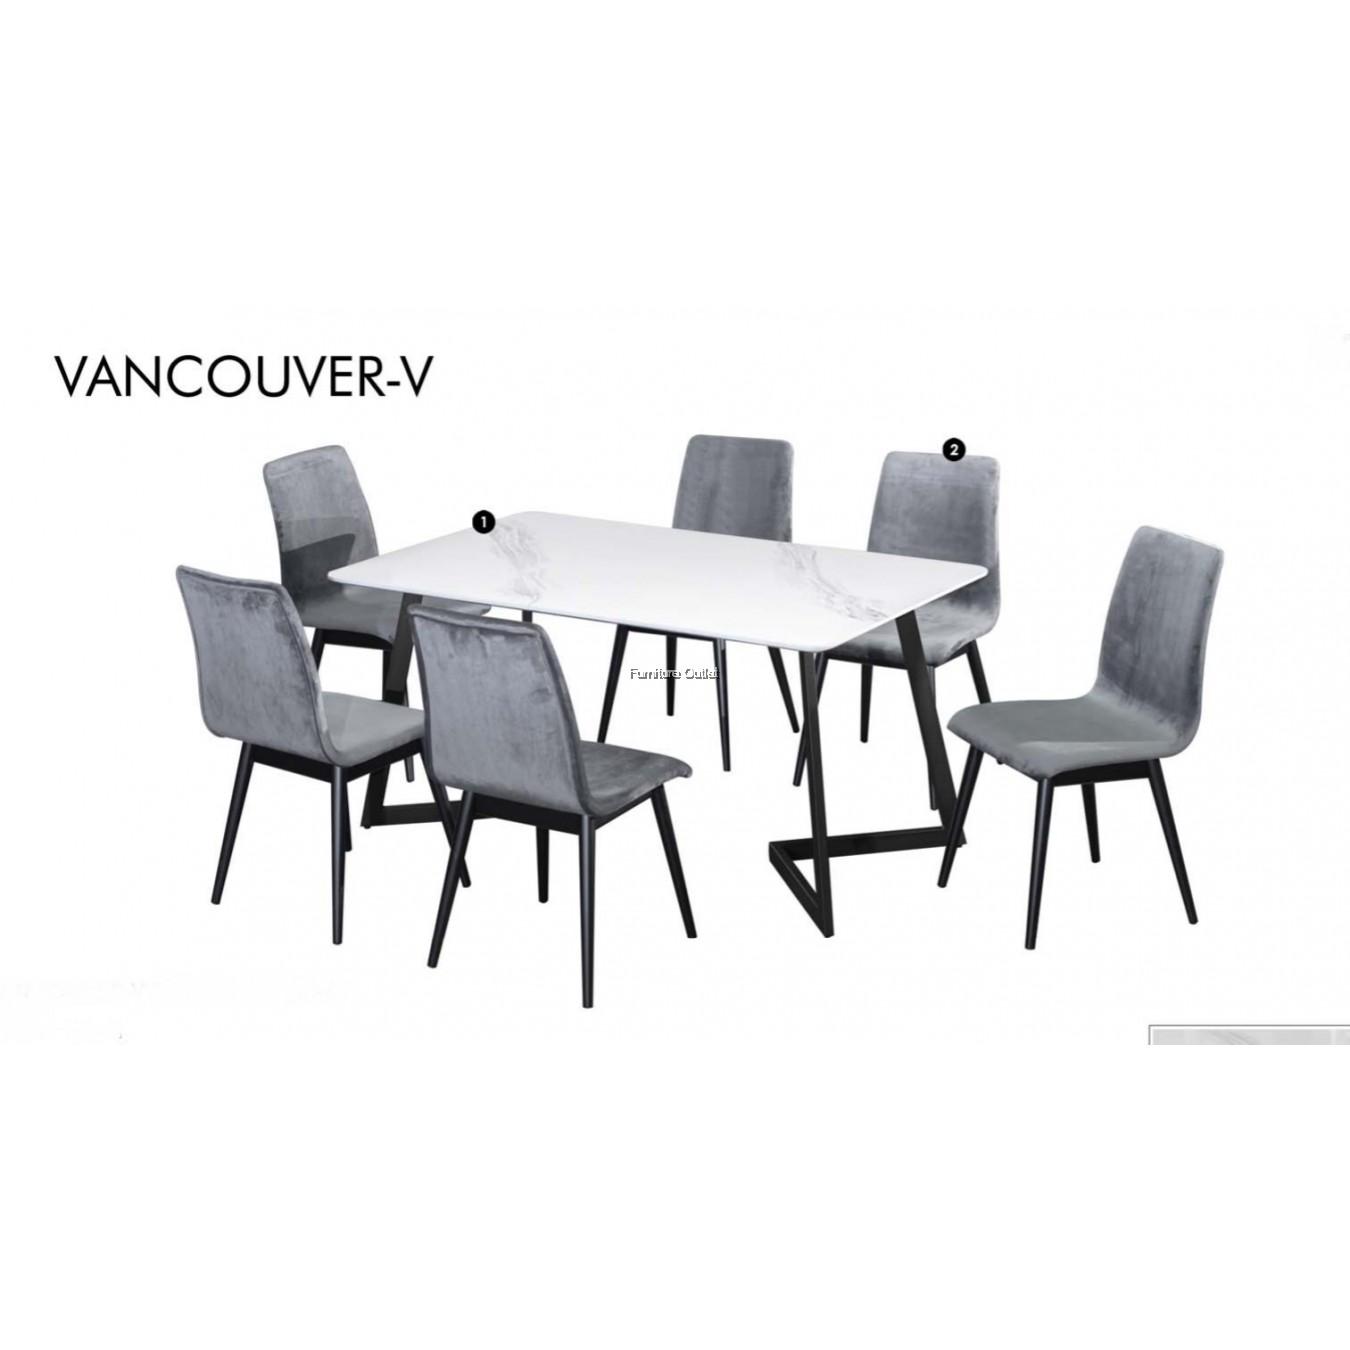 VANCOUVER-V DINING SET (1+1+2) / (1+6)